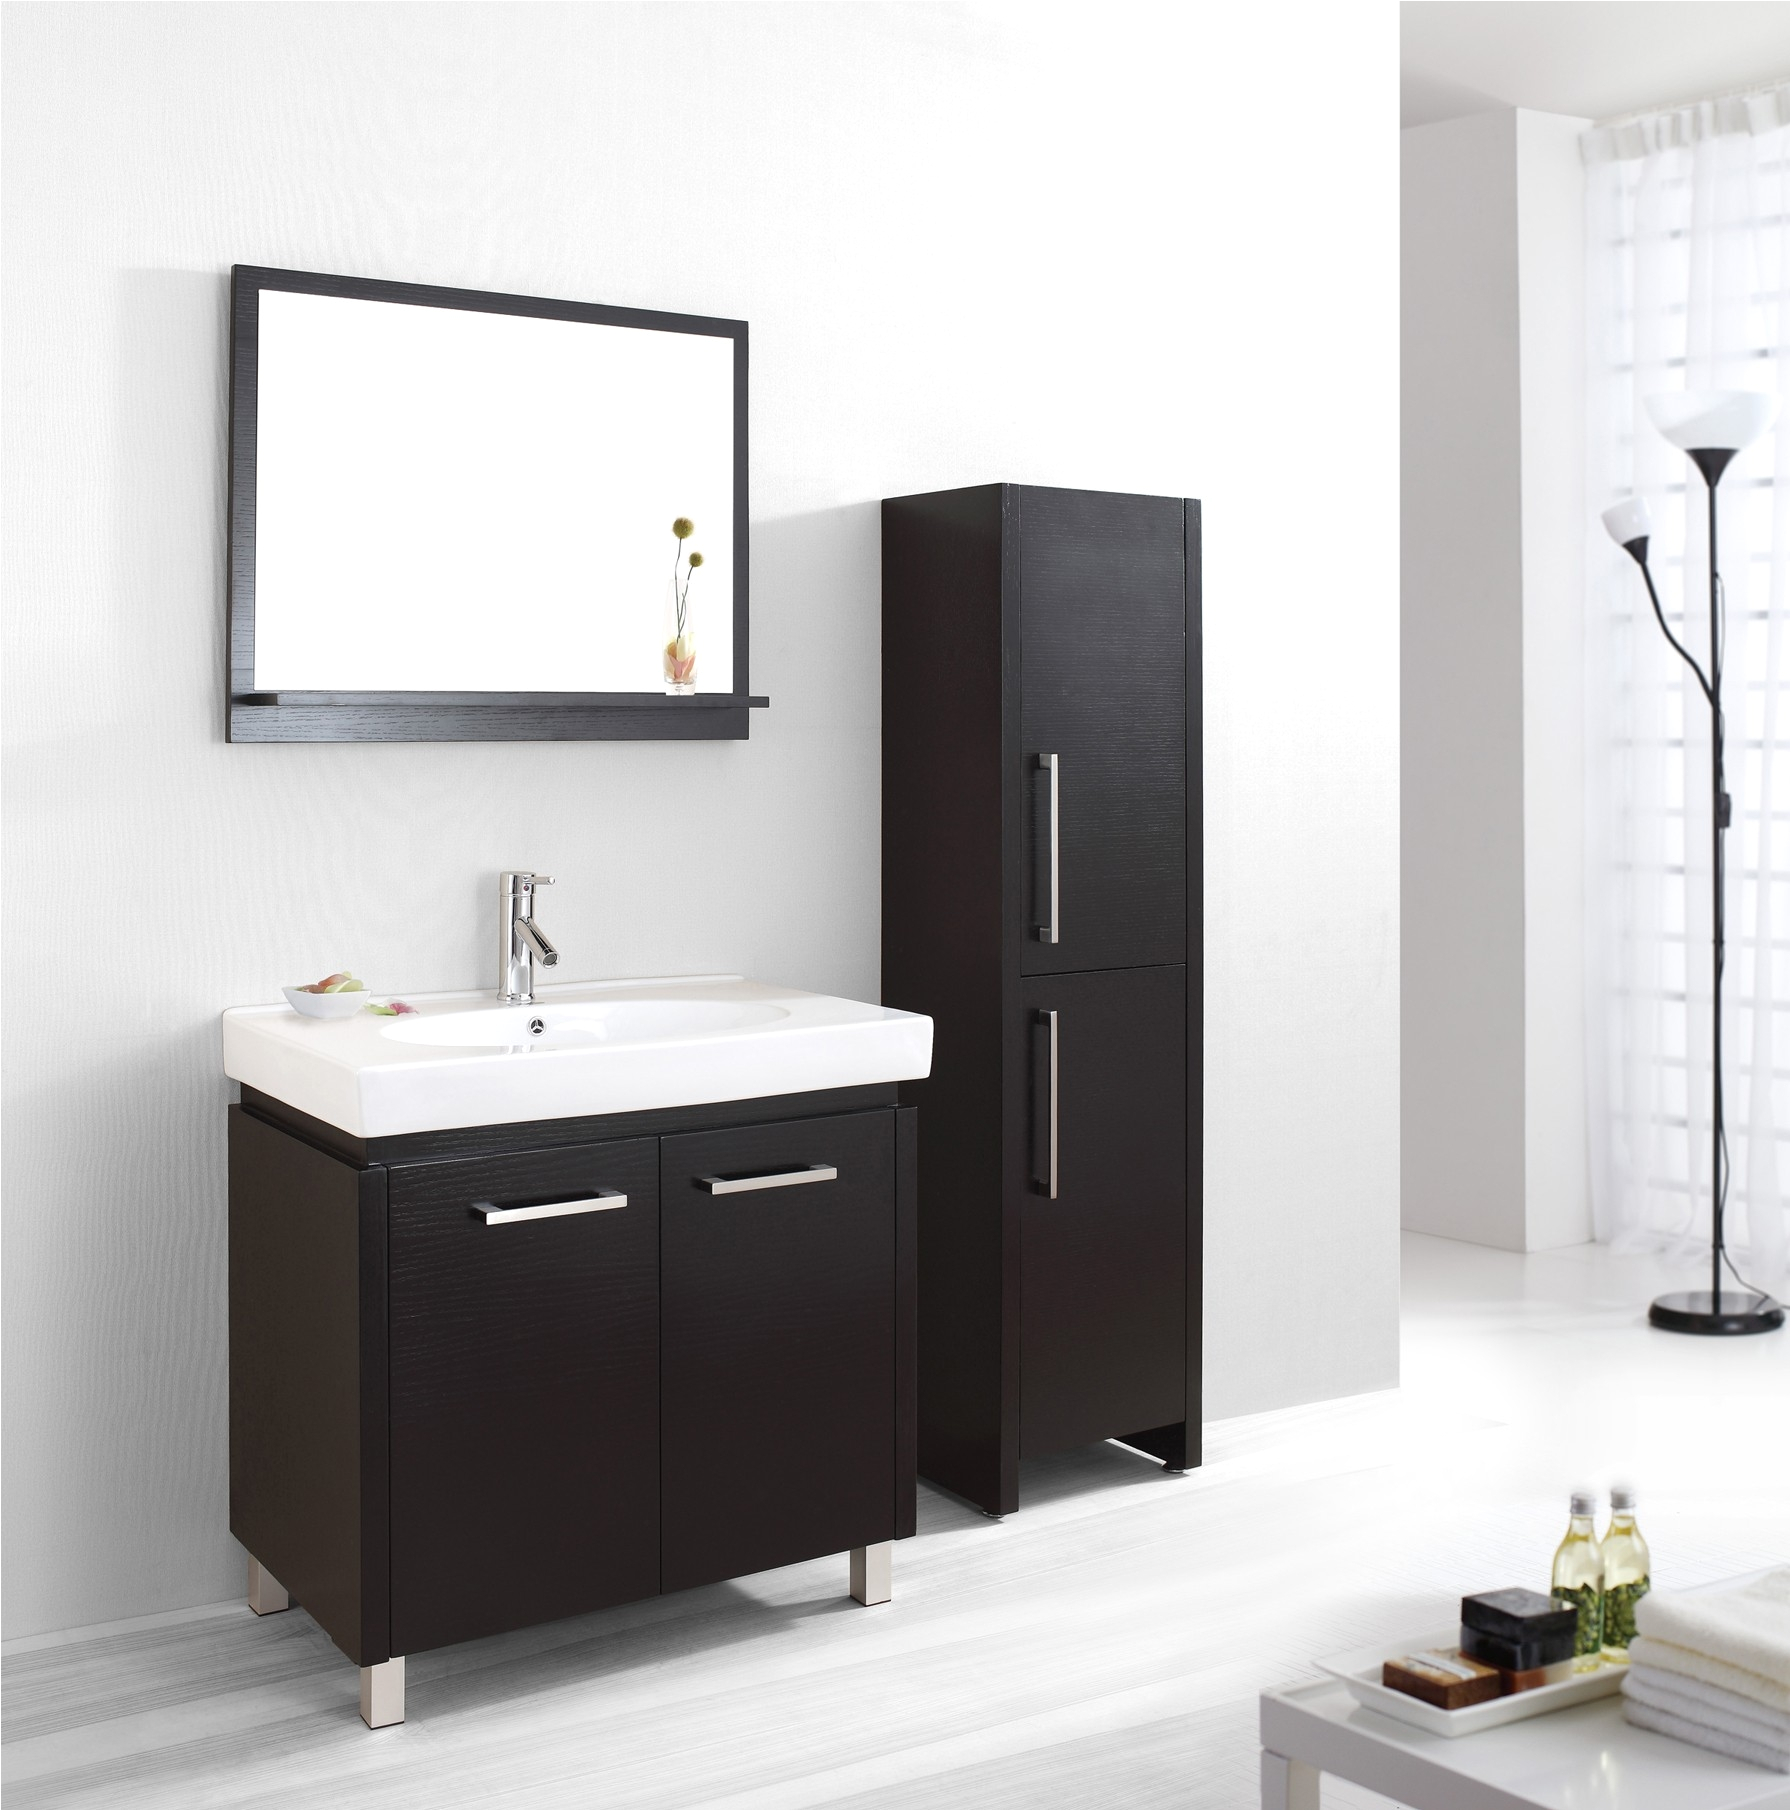 Freestanding Bathroom Vanity Ikea Free Standing Bathroom Cabinets Ikea Bathroom Design Ideas